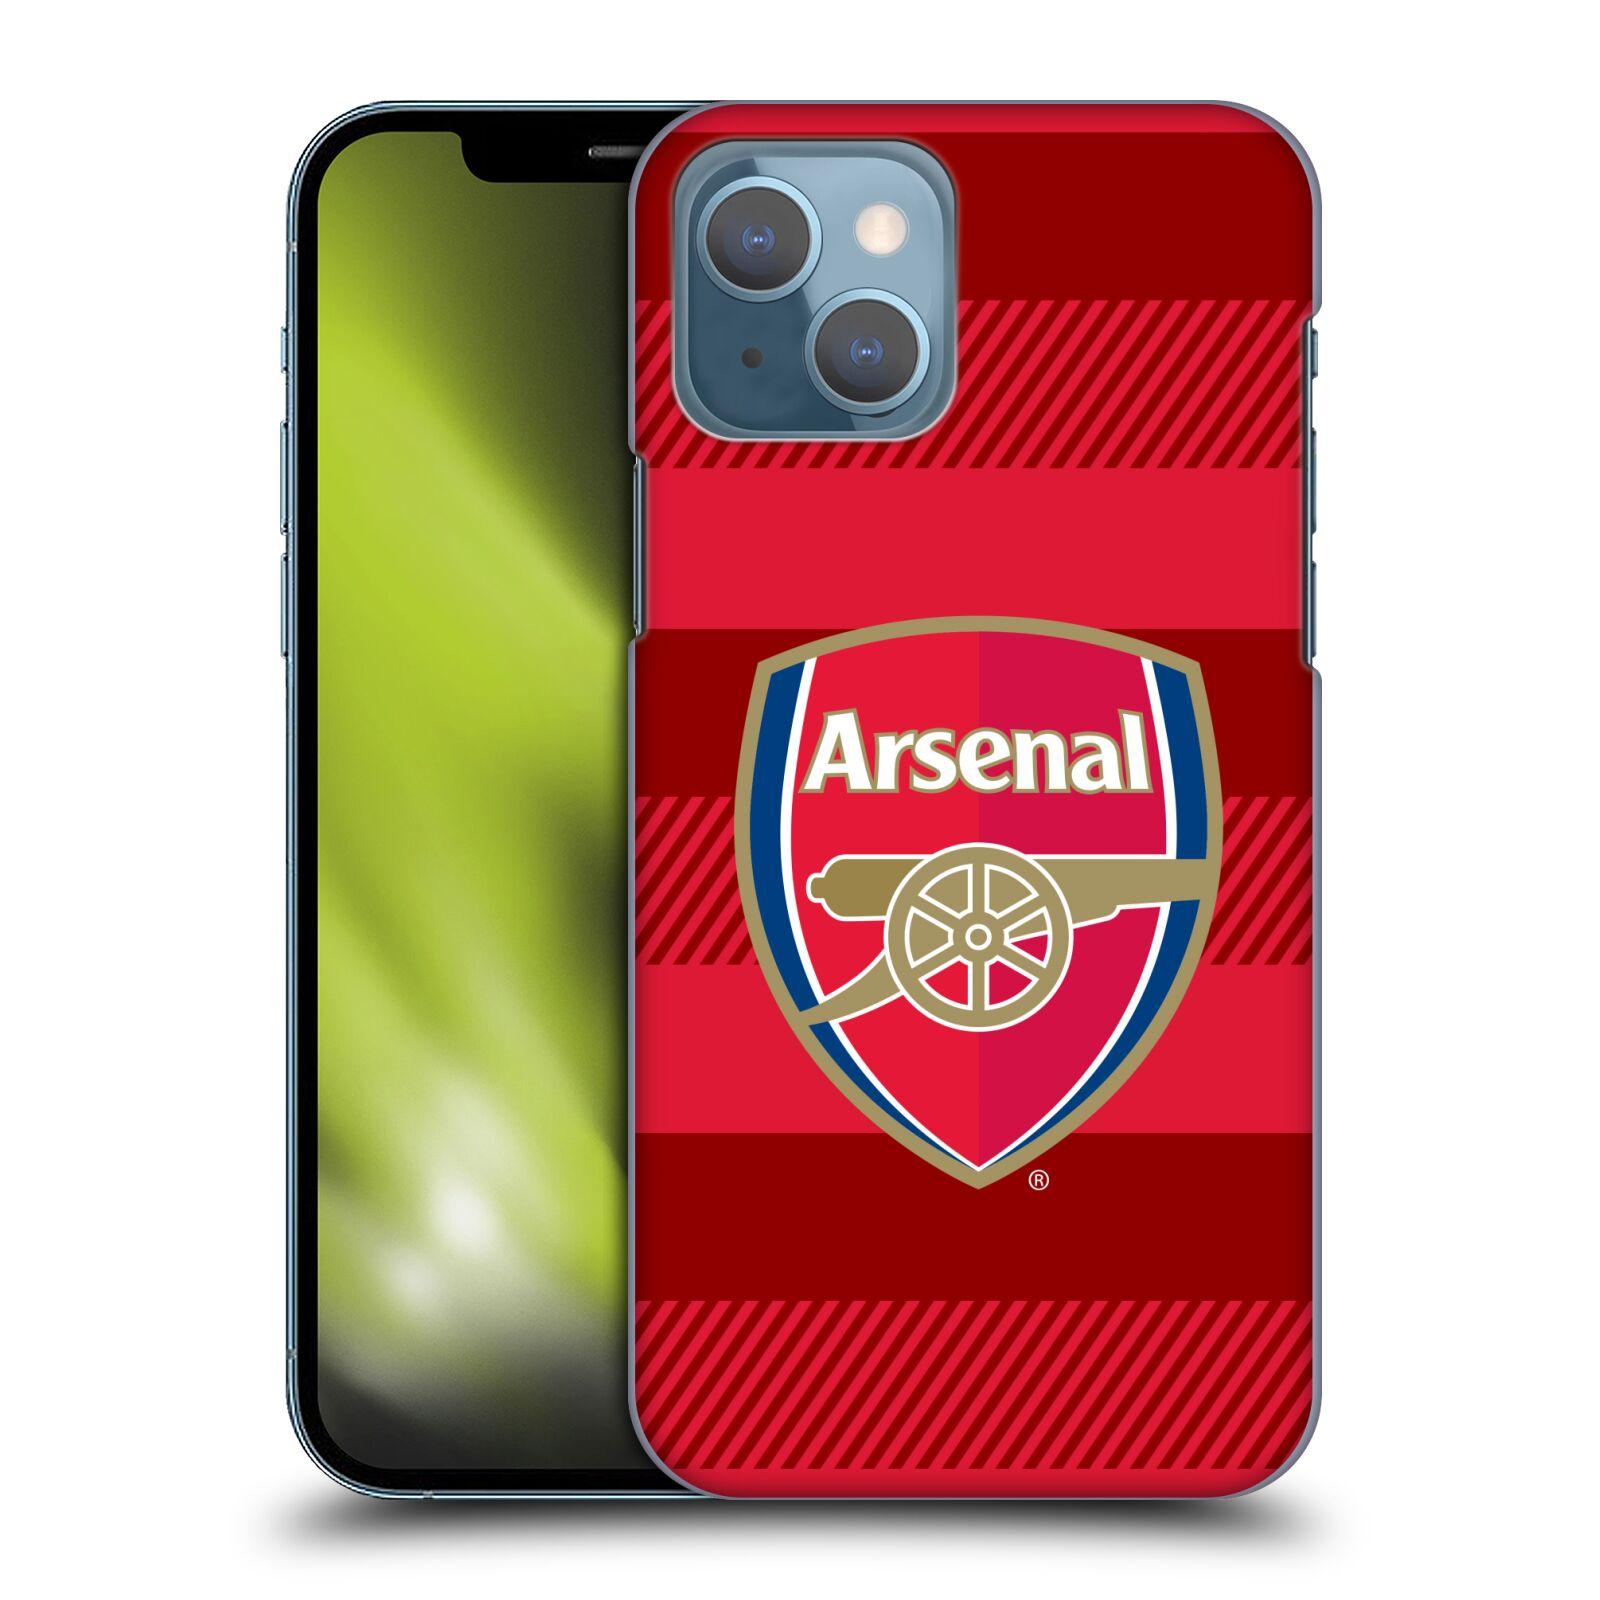 Plastové pouzdro na mobil Apple iPhone 13 - Head Case - Arsenal FC - Logo s pruhy